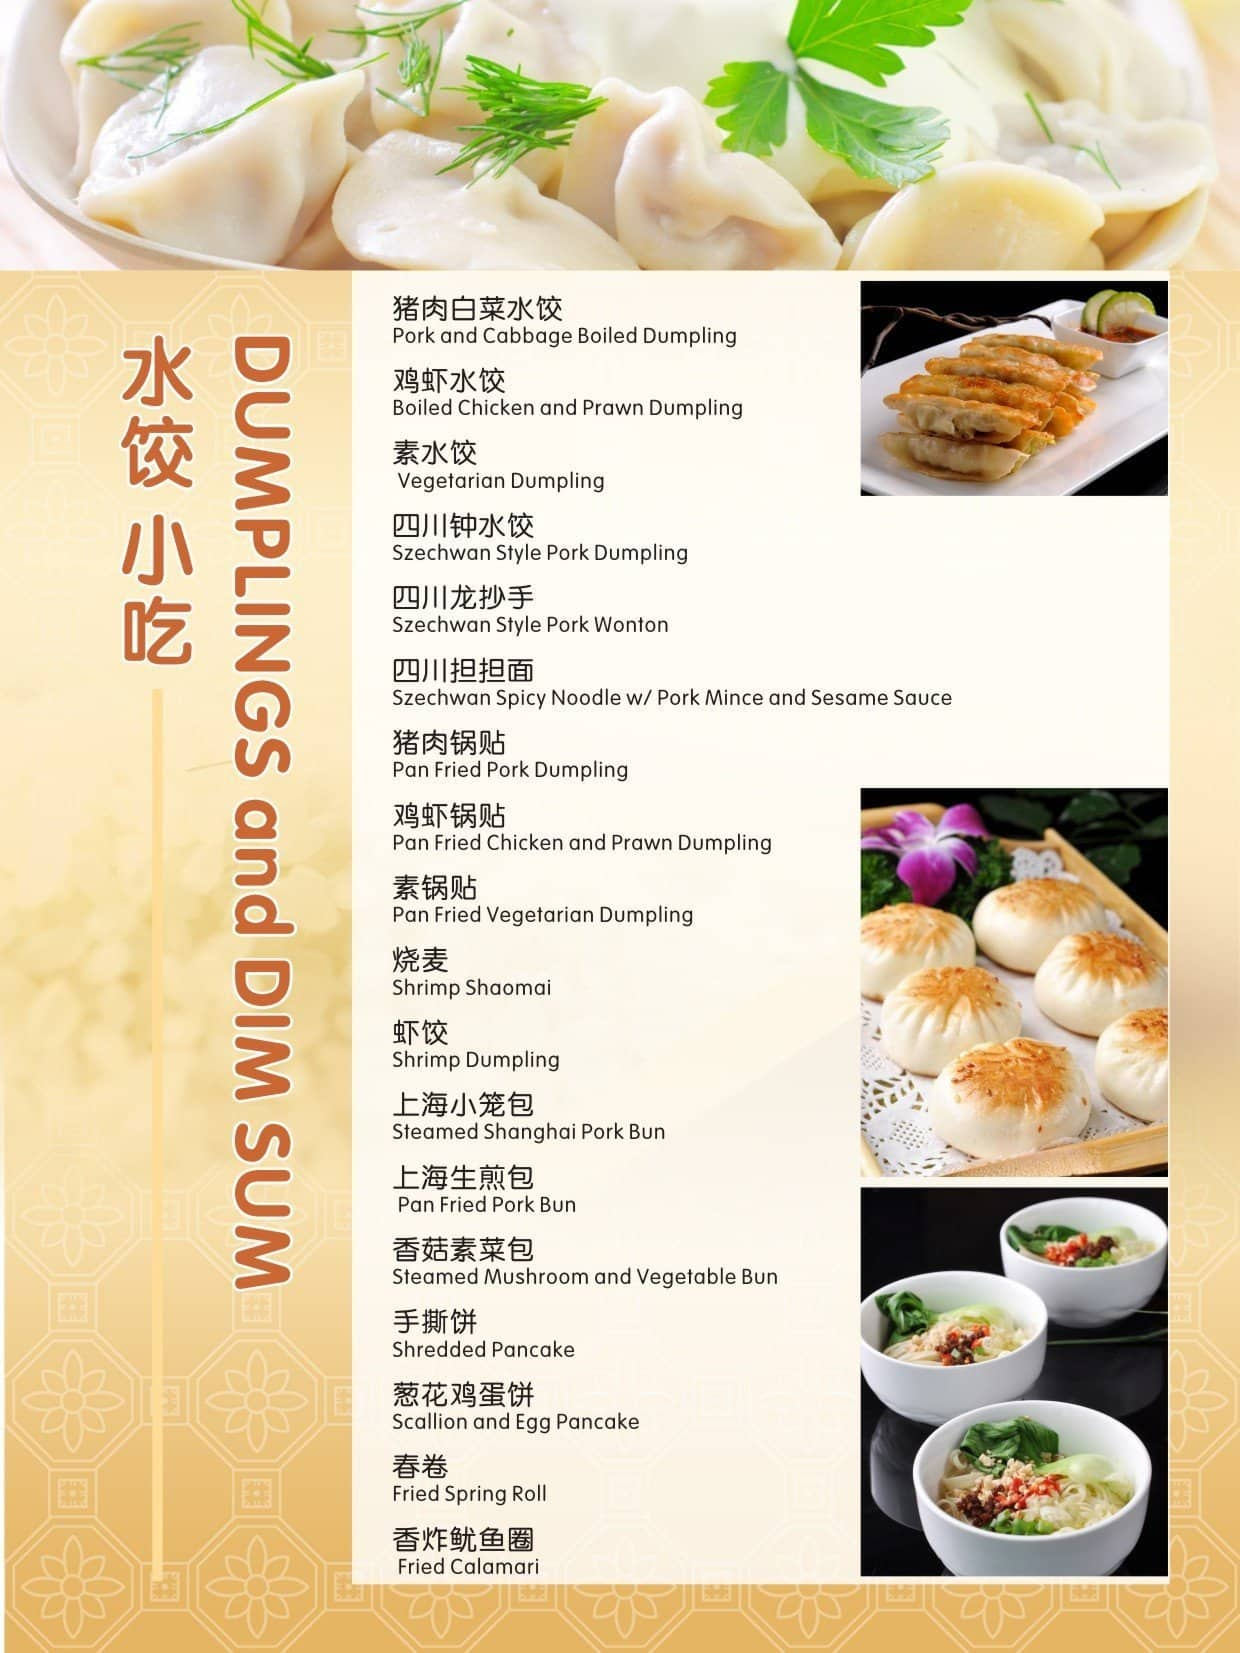 Menu at Sichuan Dining Room restaurant, Melbourne, 491 Swanston St